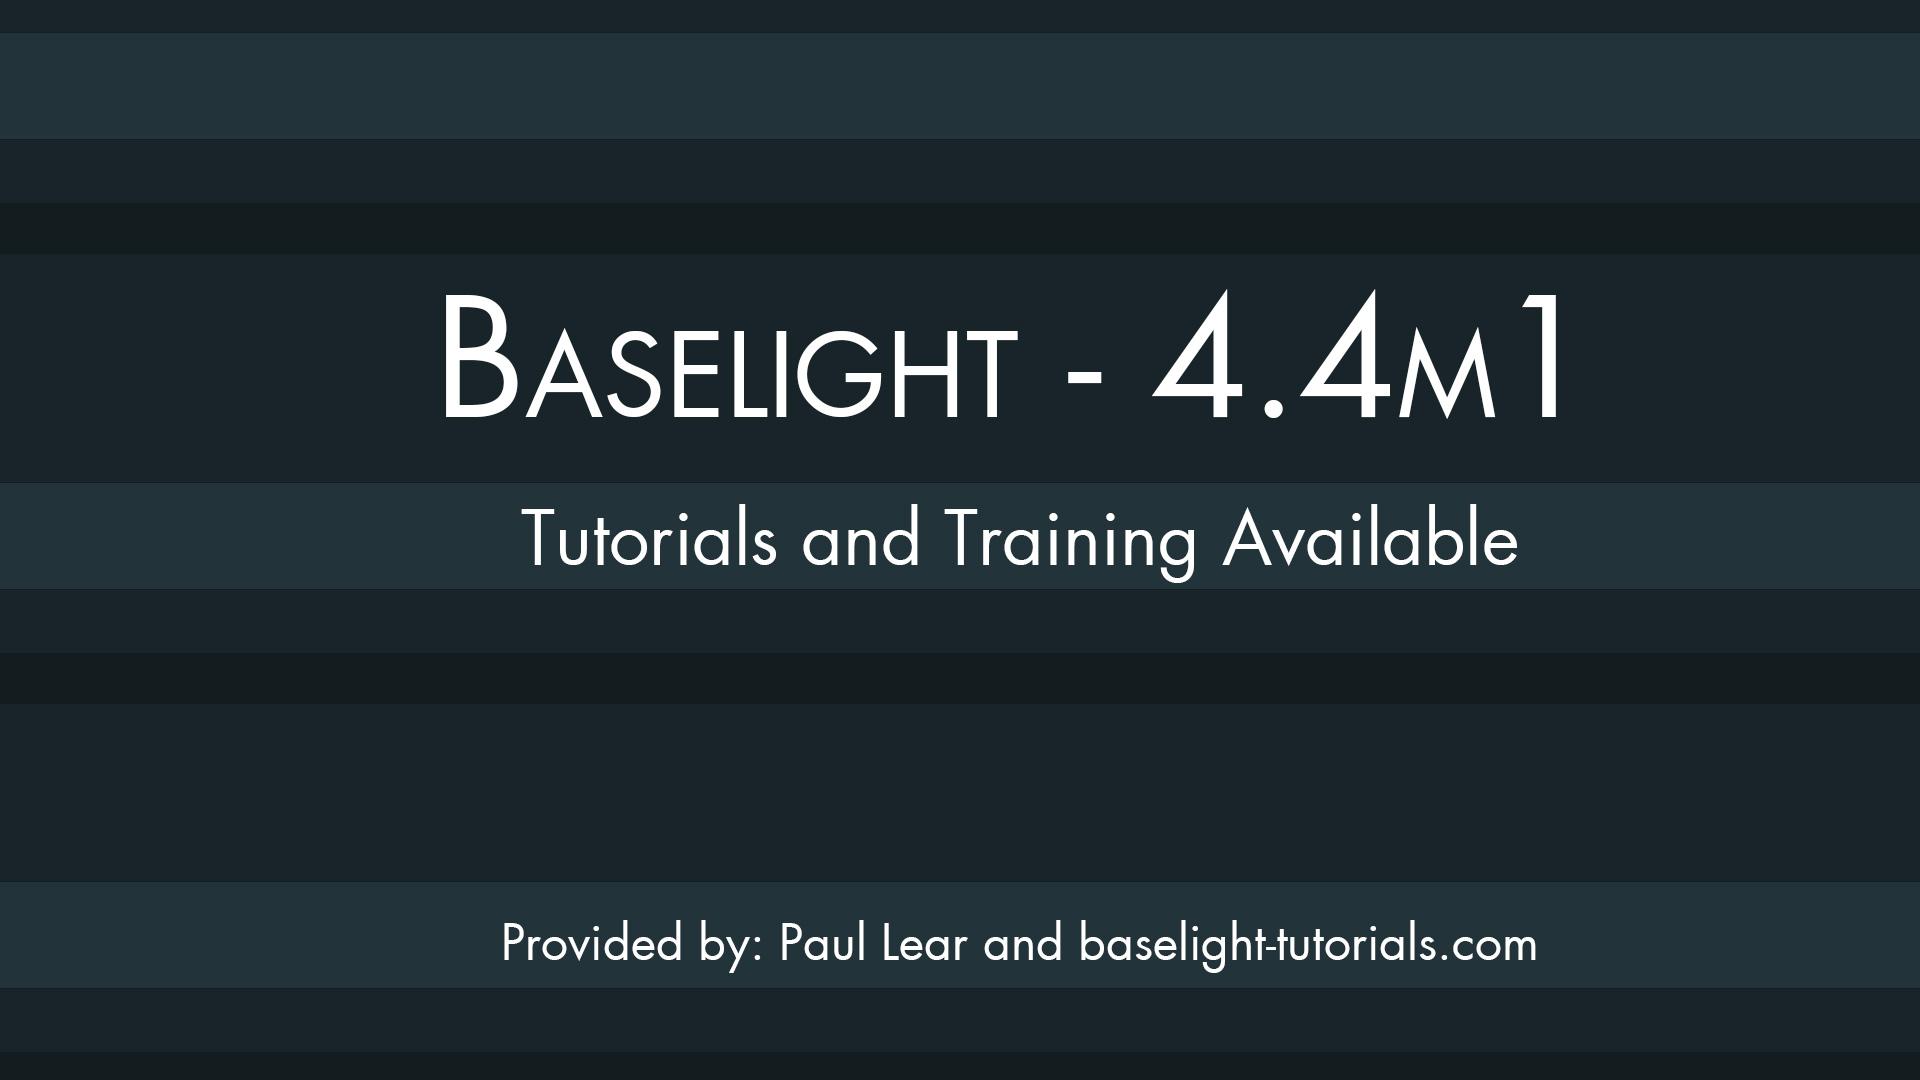 Baselight-4-4m1